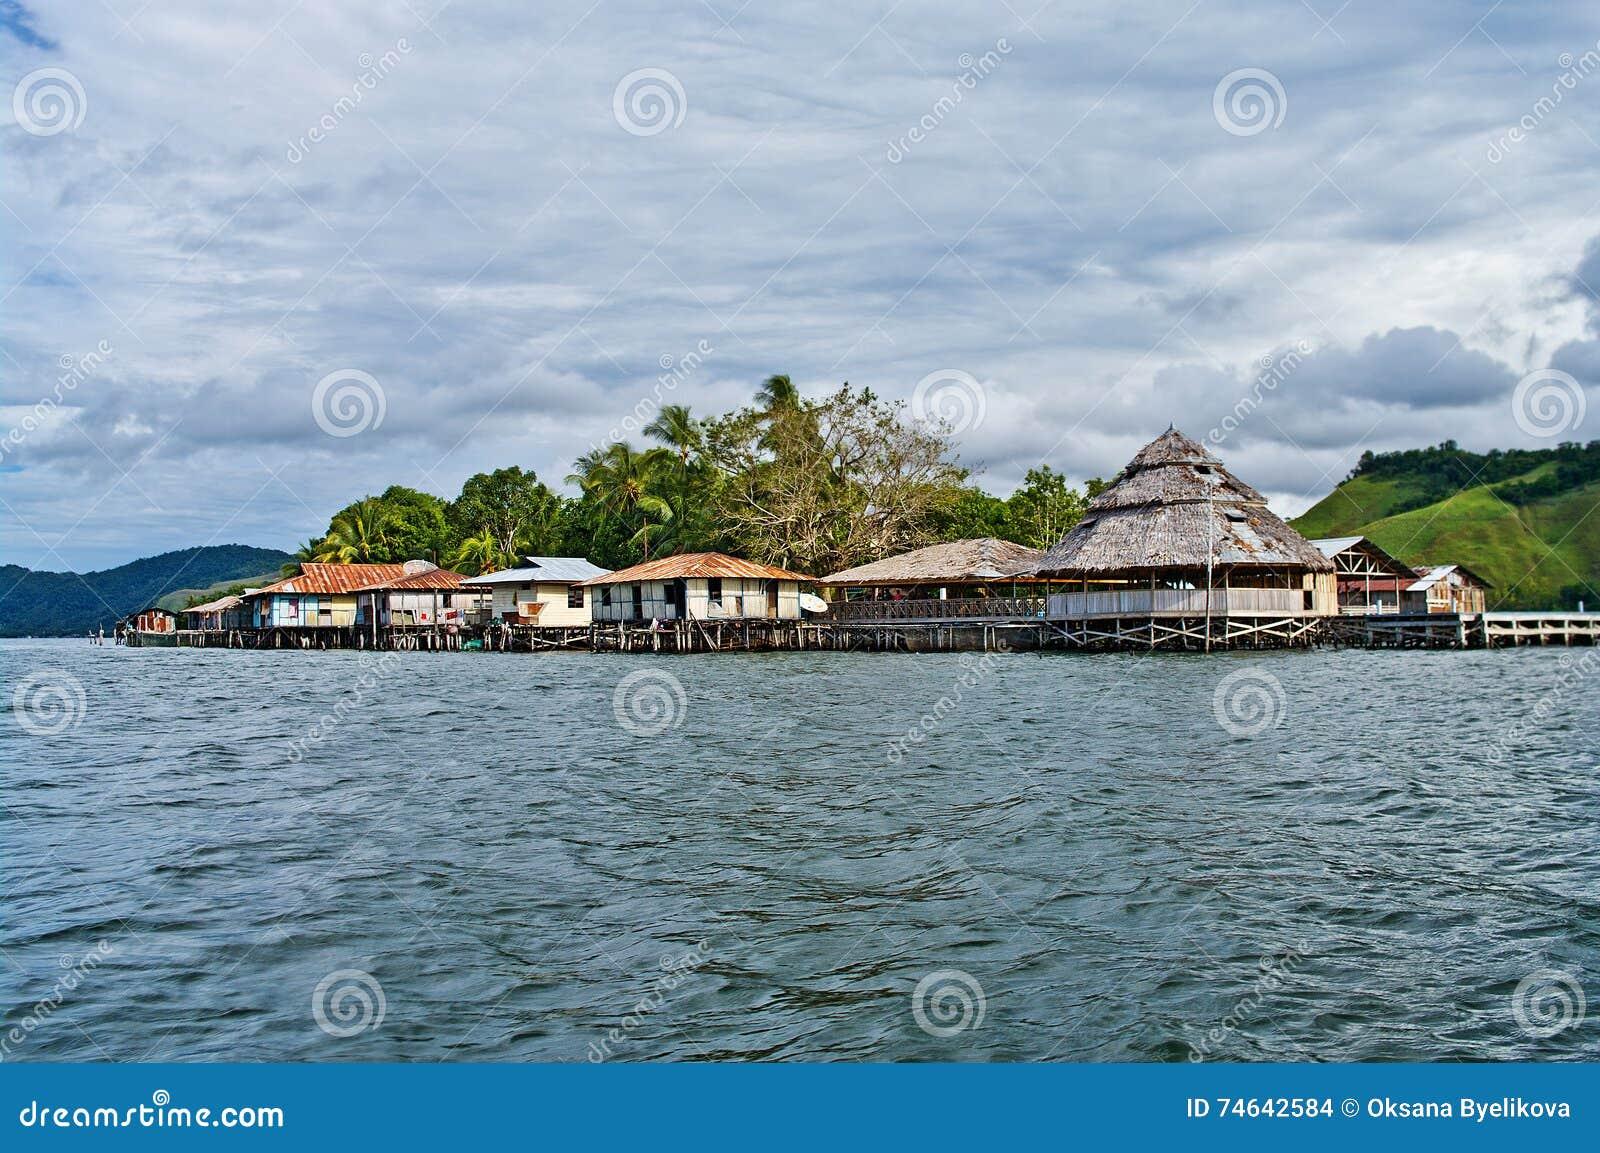 Wooden houses on lake Sentani, on New Guinea